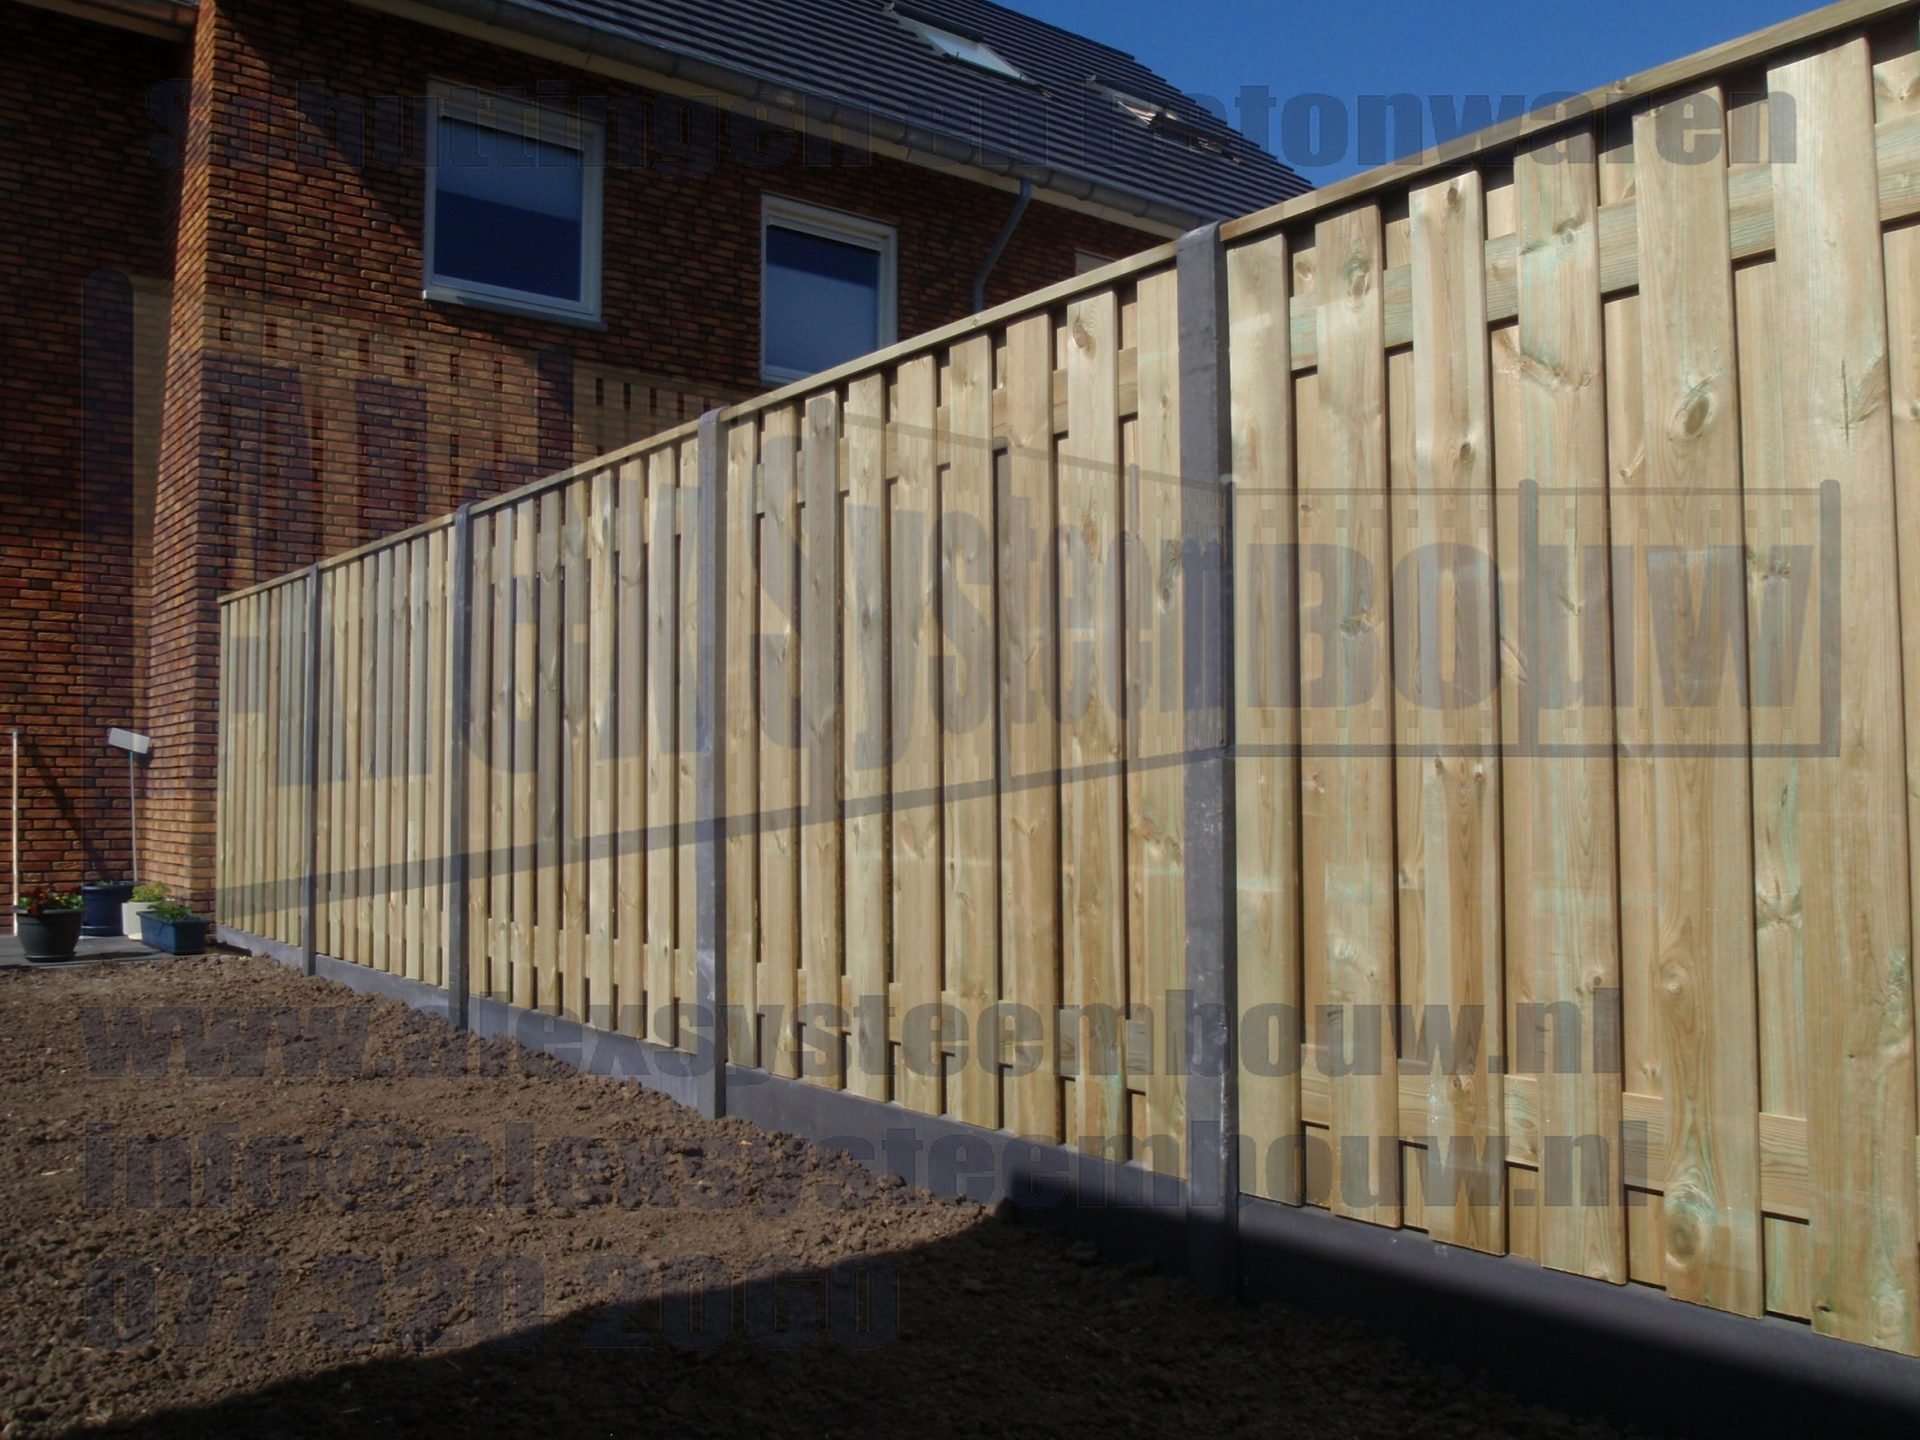 goedkope-schutting-hout-beton-19-planks-tuinschermen